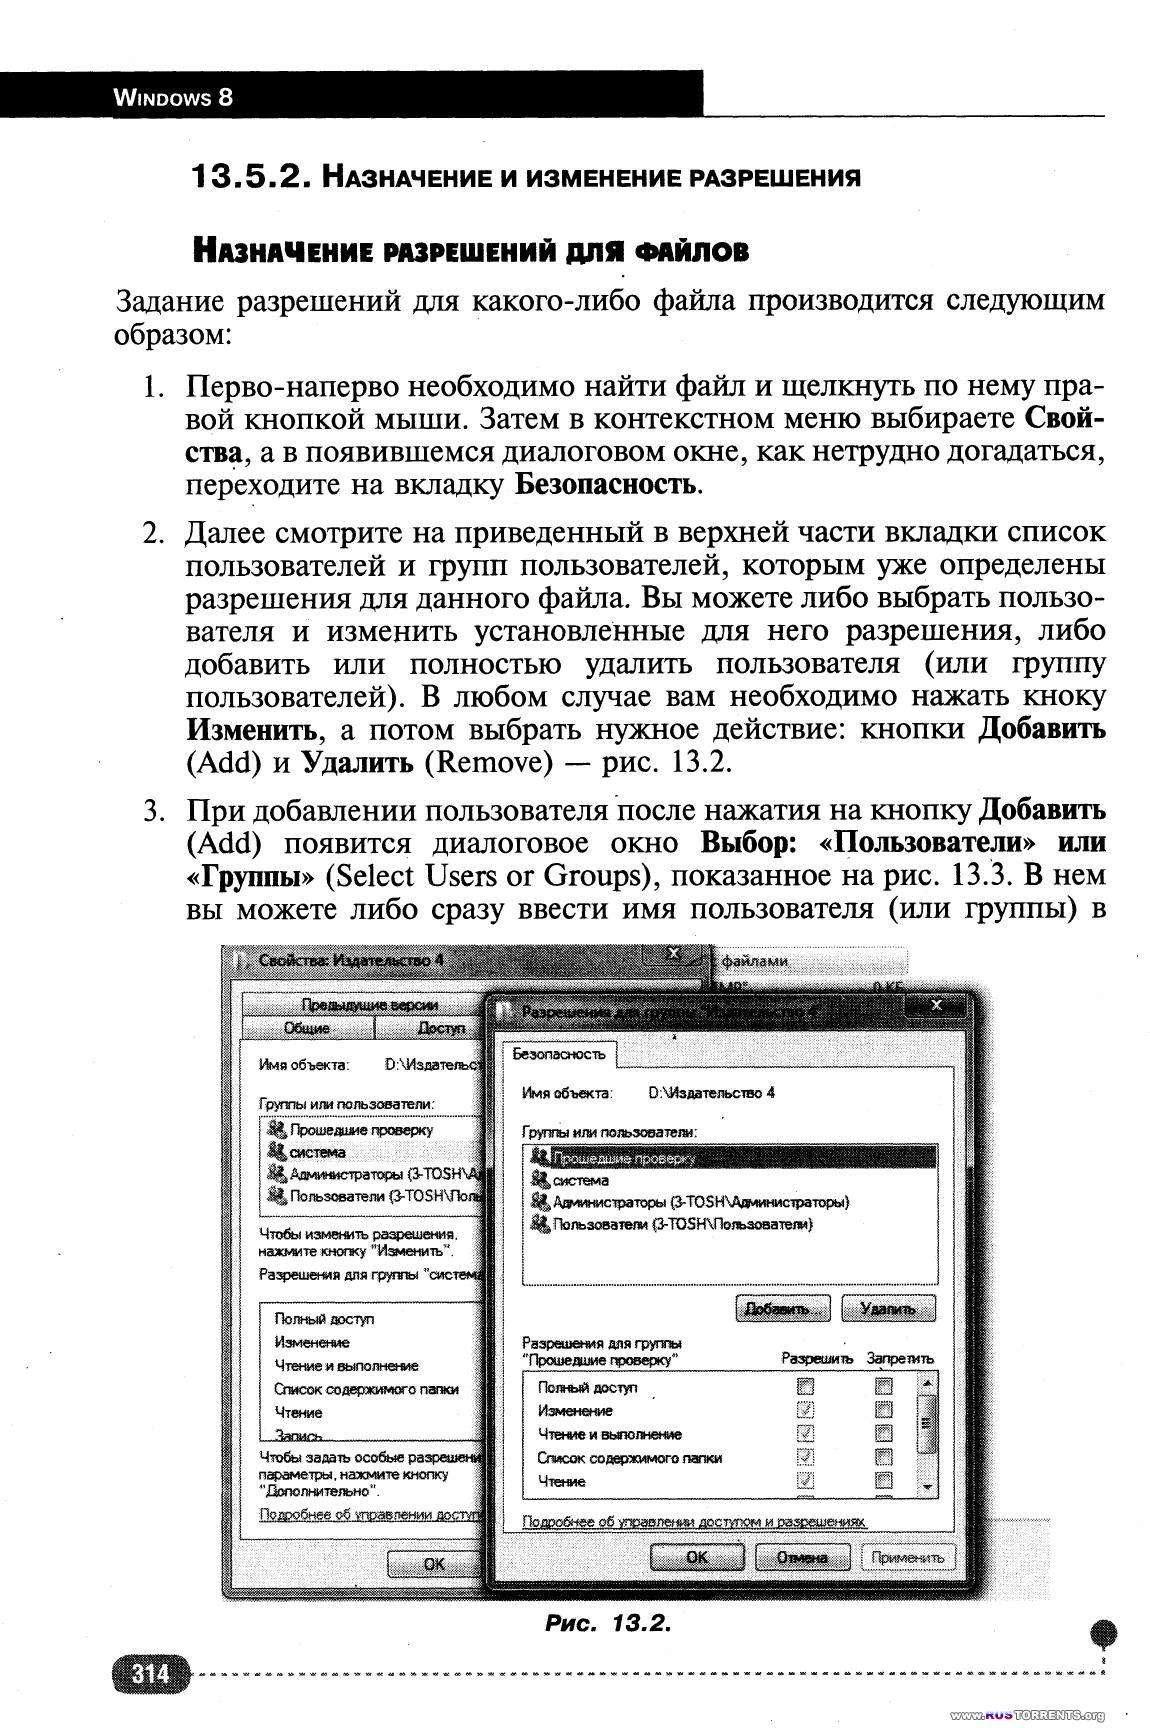 �. �������, �. ����, �. ������ - Microsoft Windows 8. ������ ����������� | PDF